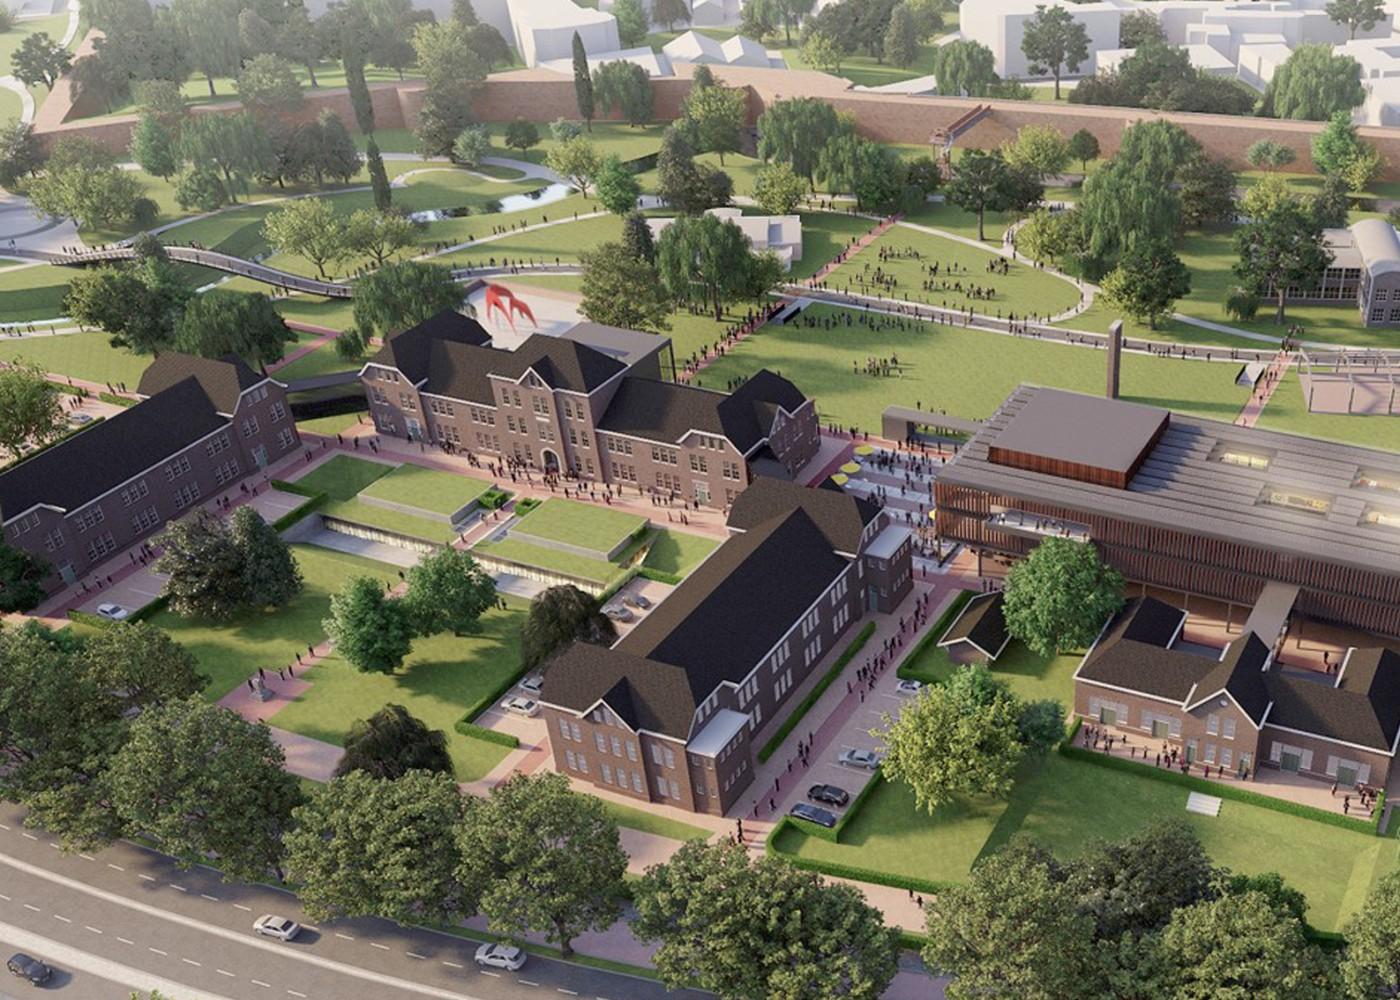 buro-sant-en-co-landschapsarchitectuur-tapijnkazerne-maastricht-transformatie-herbestemming-campus-universiteit-maastricht-stadspark-ecologie-1